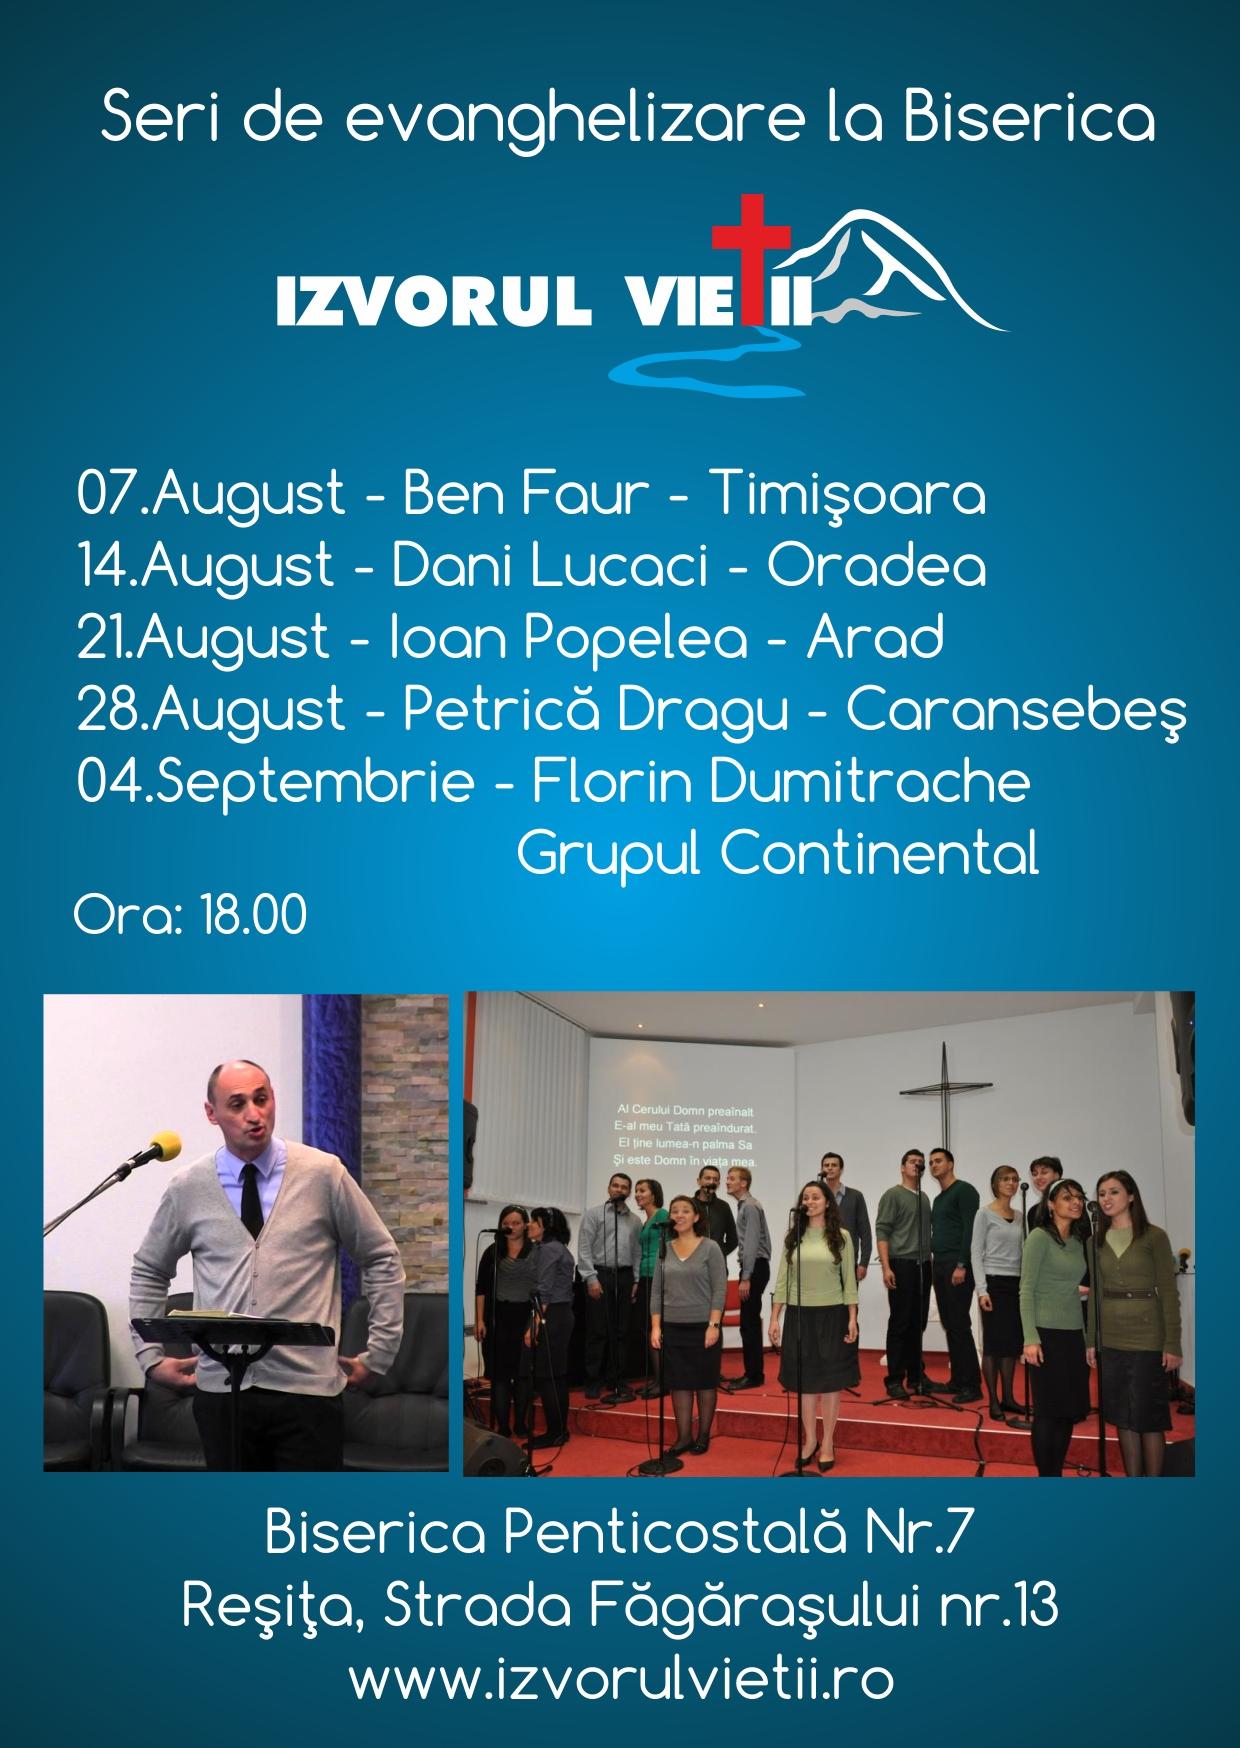 evanghelizare august 2016